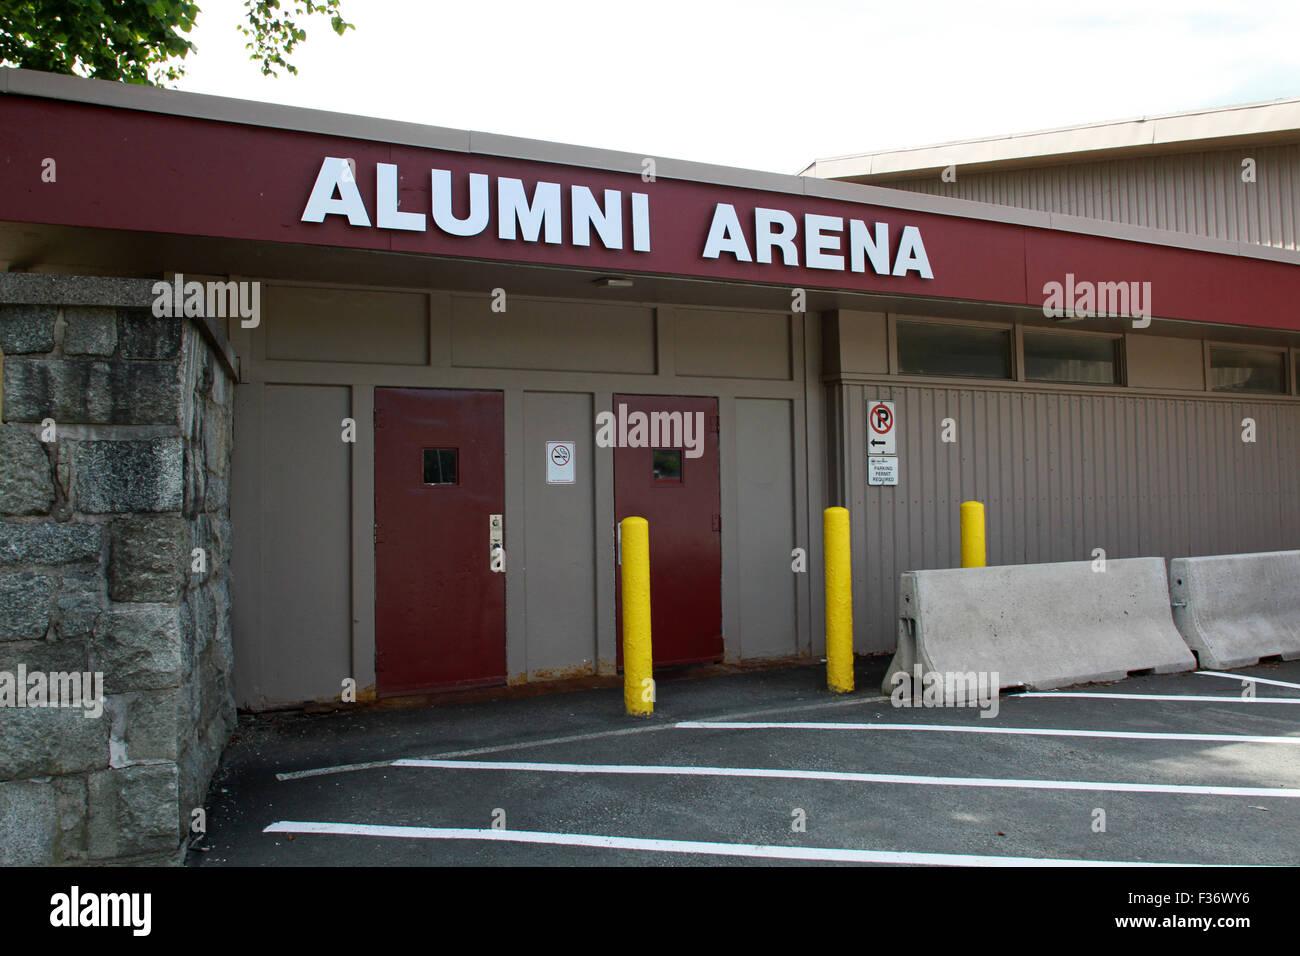 Alumni Arena at Saint Mary's University in Halifax, N.S. - Stock Image